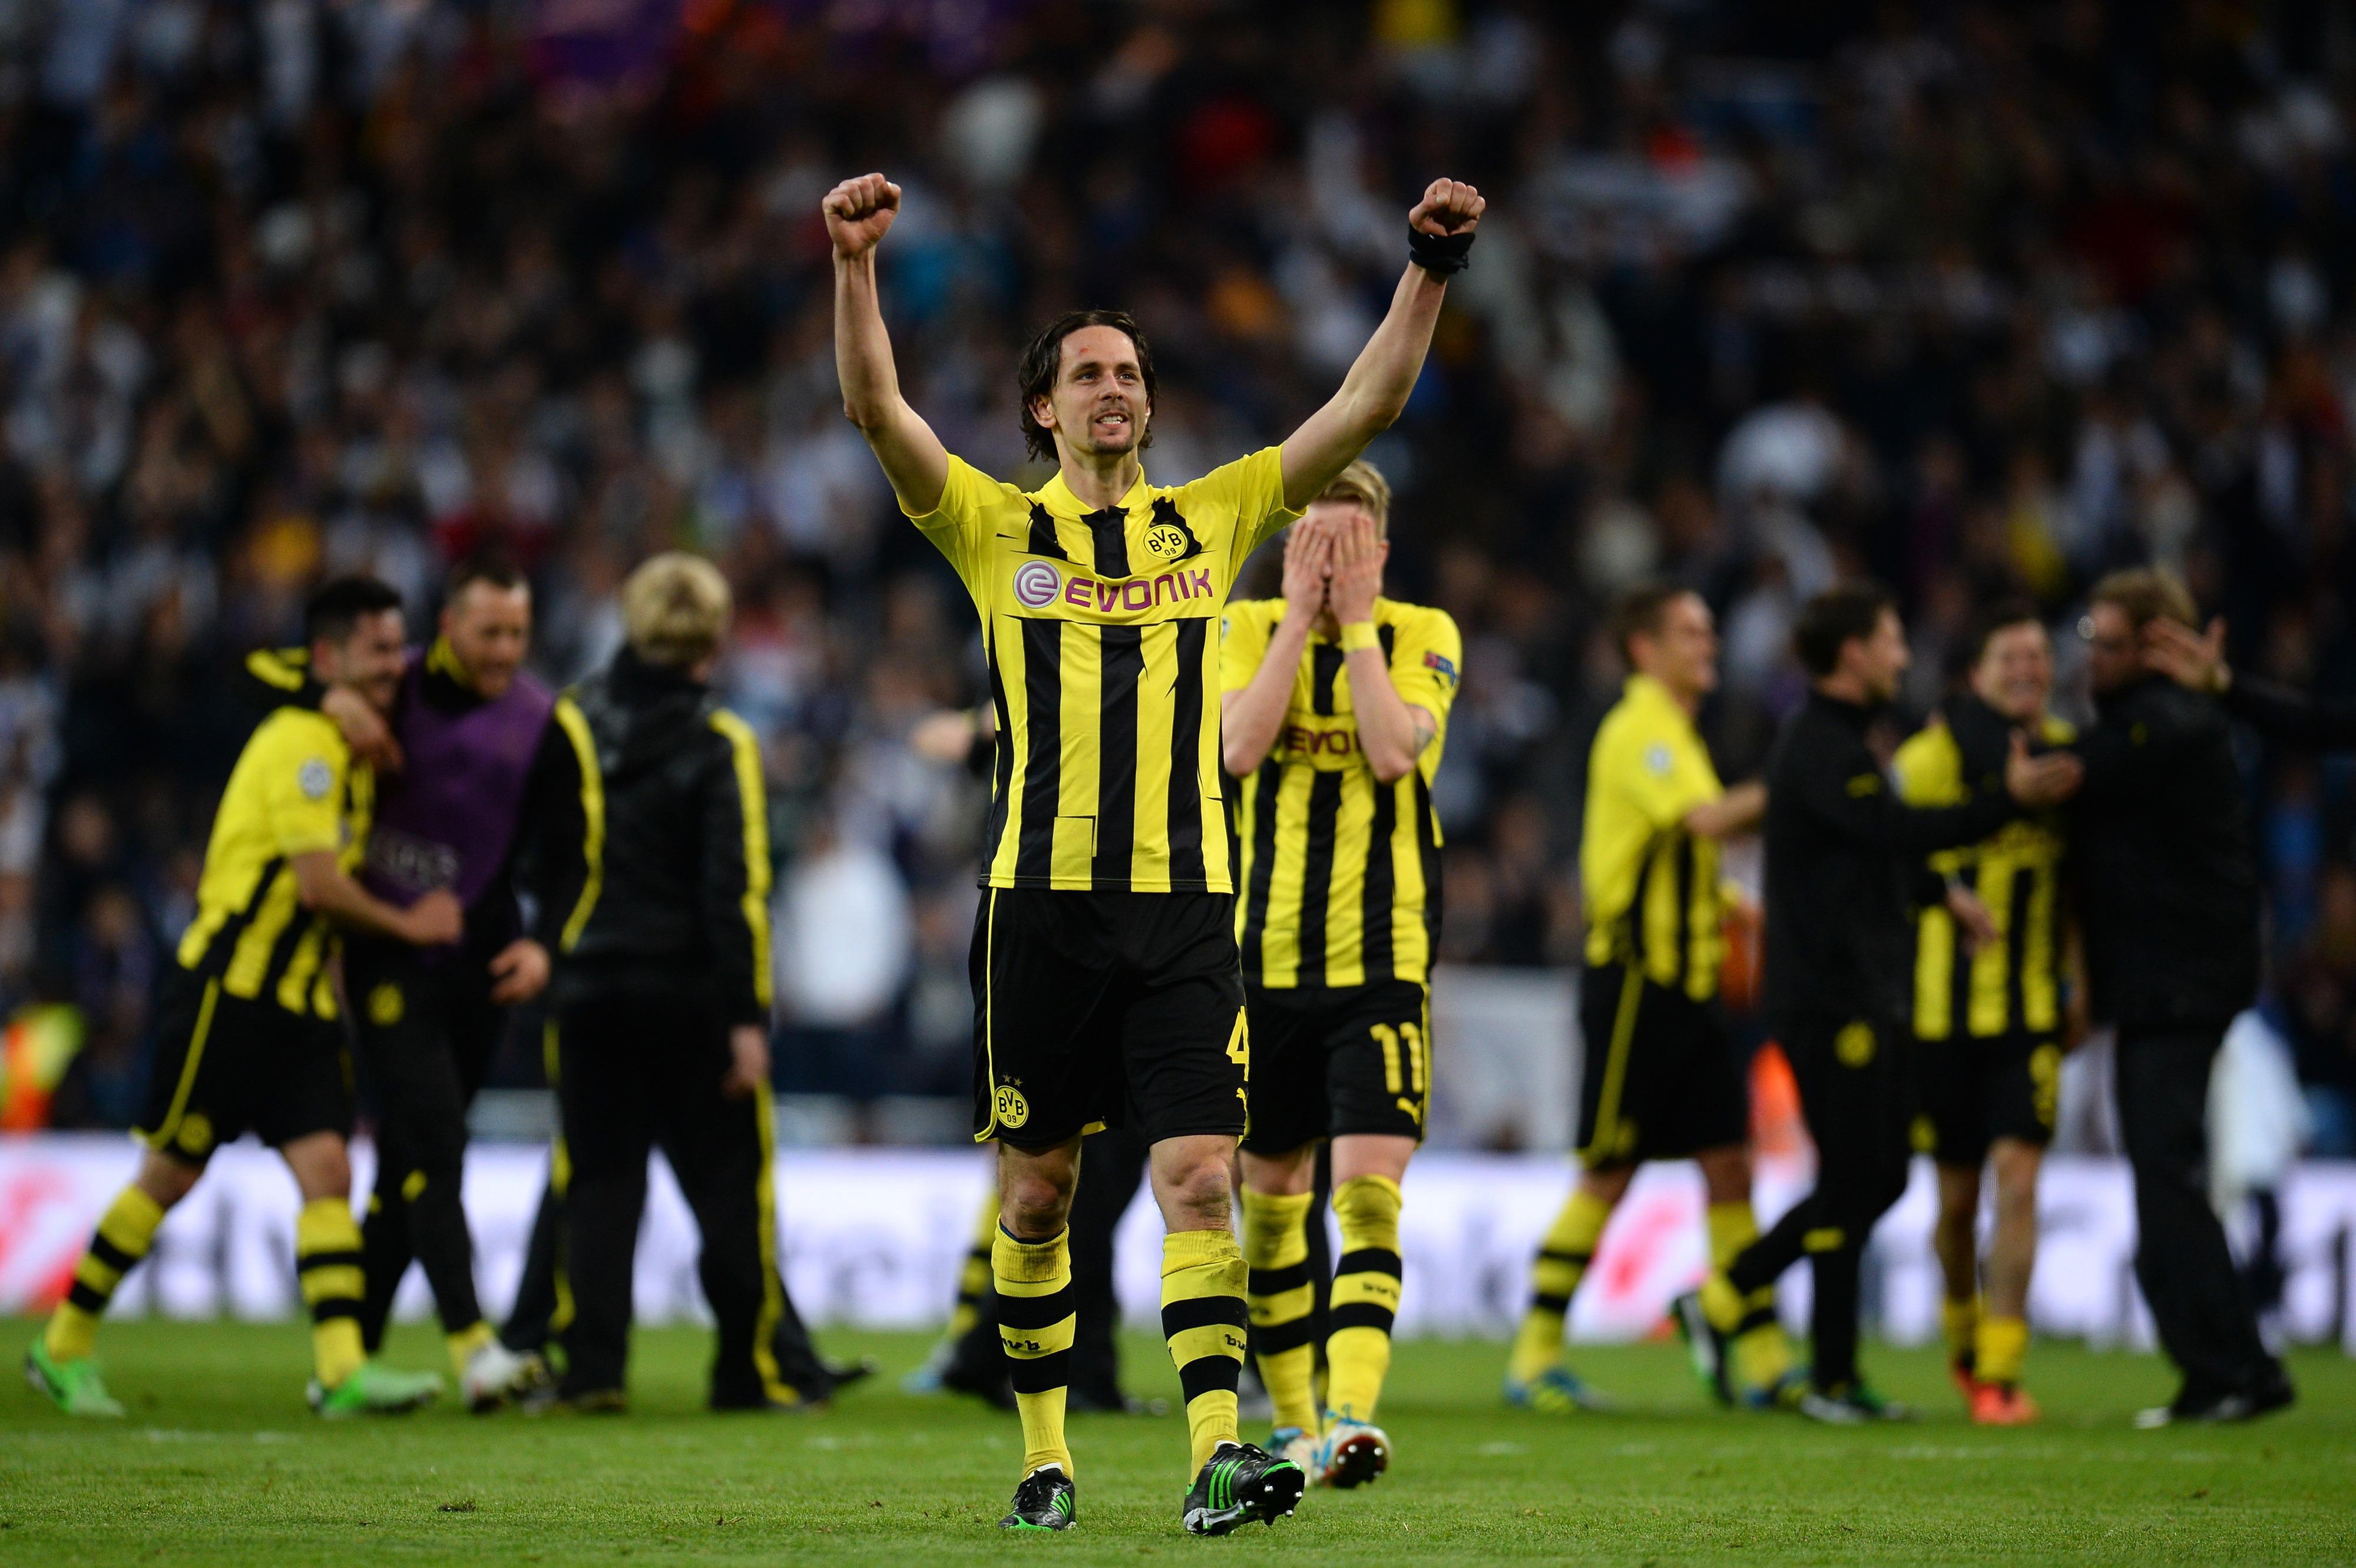 Neven Subotic makes amazing clearance, is new Dortmund god